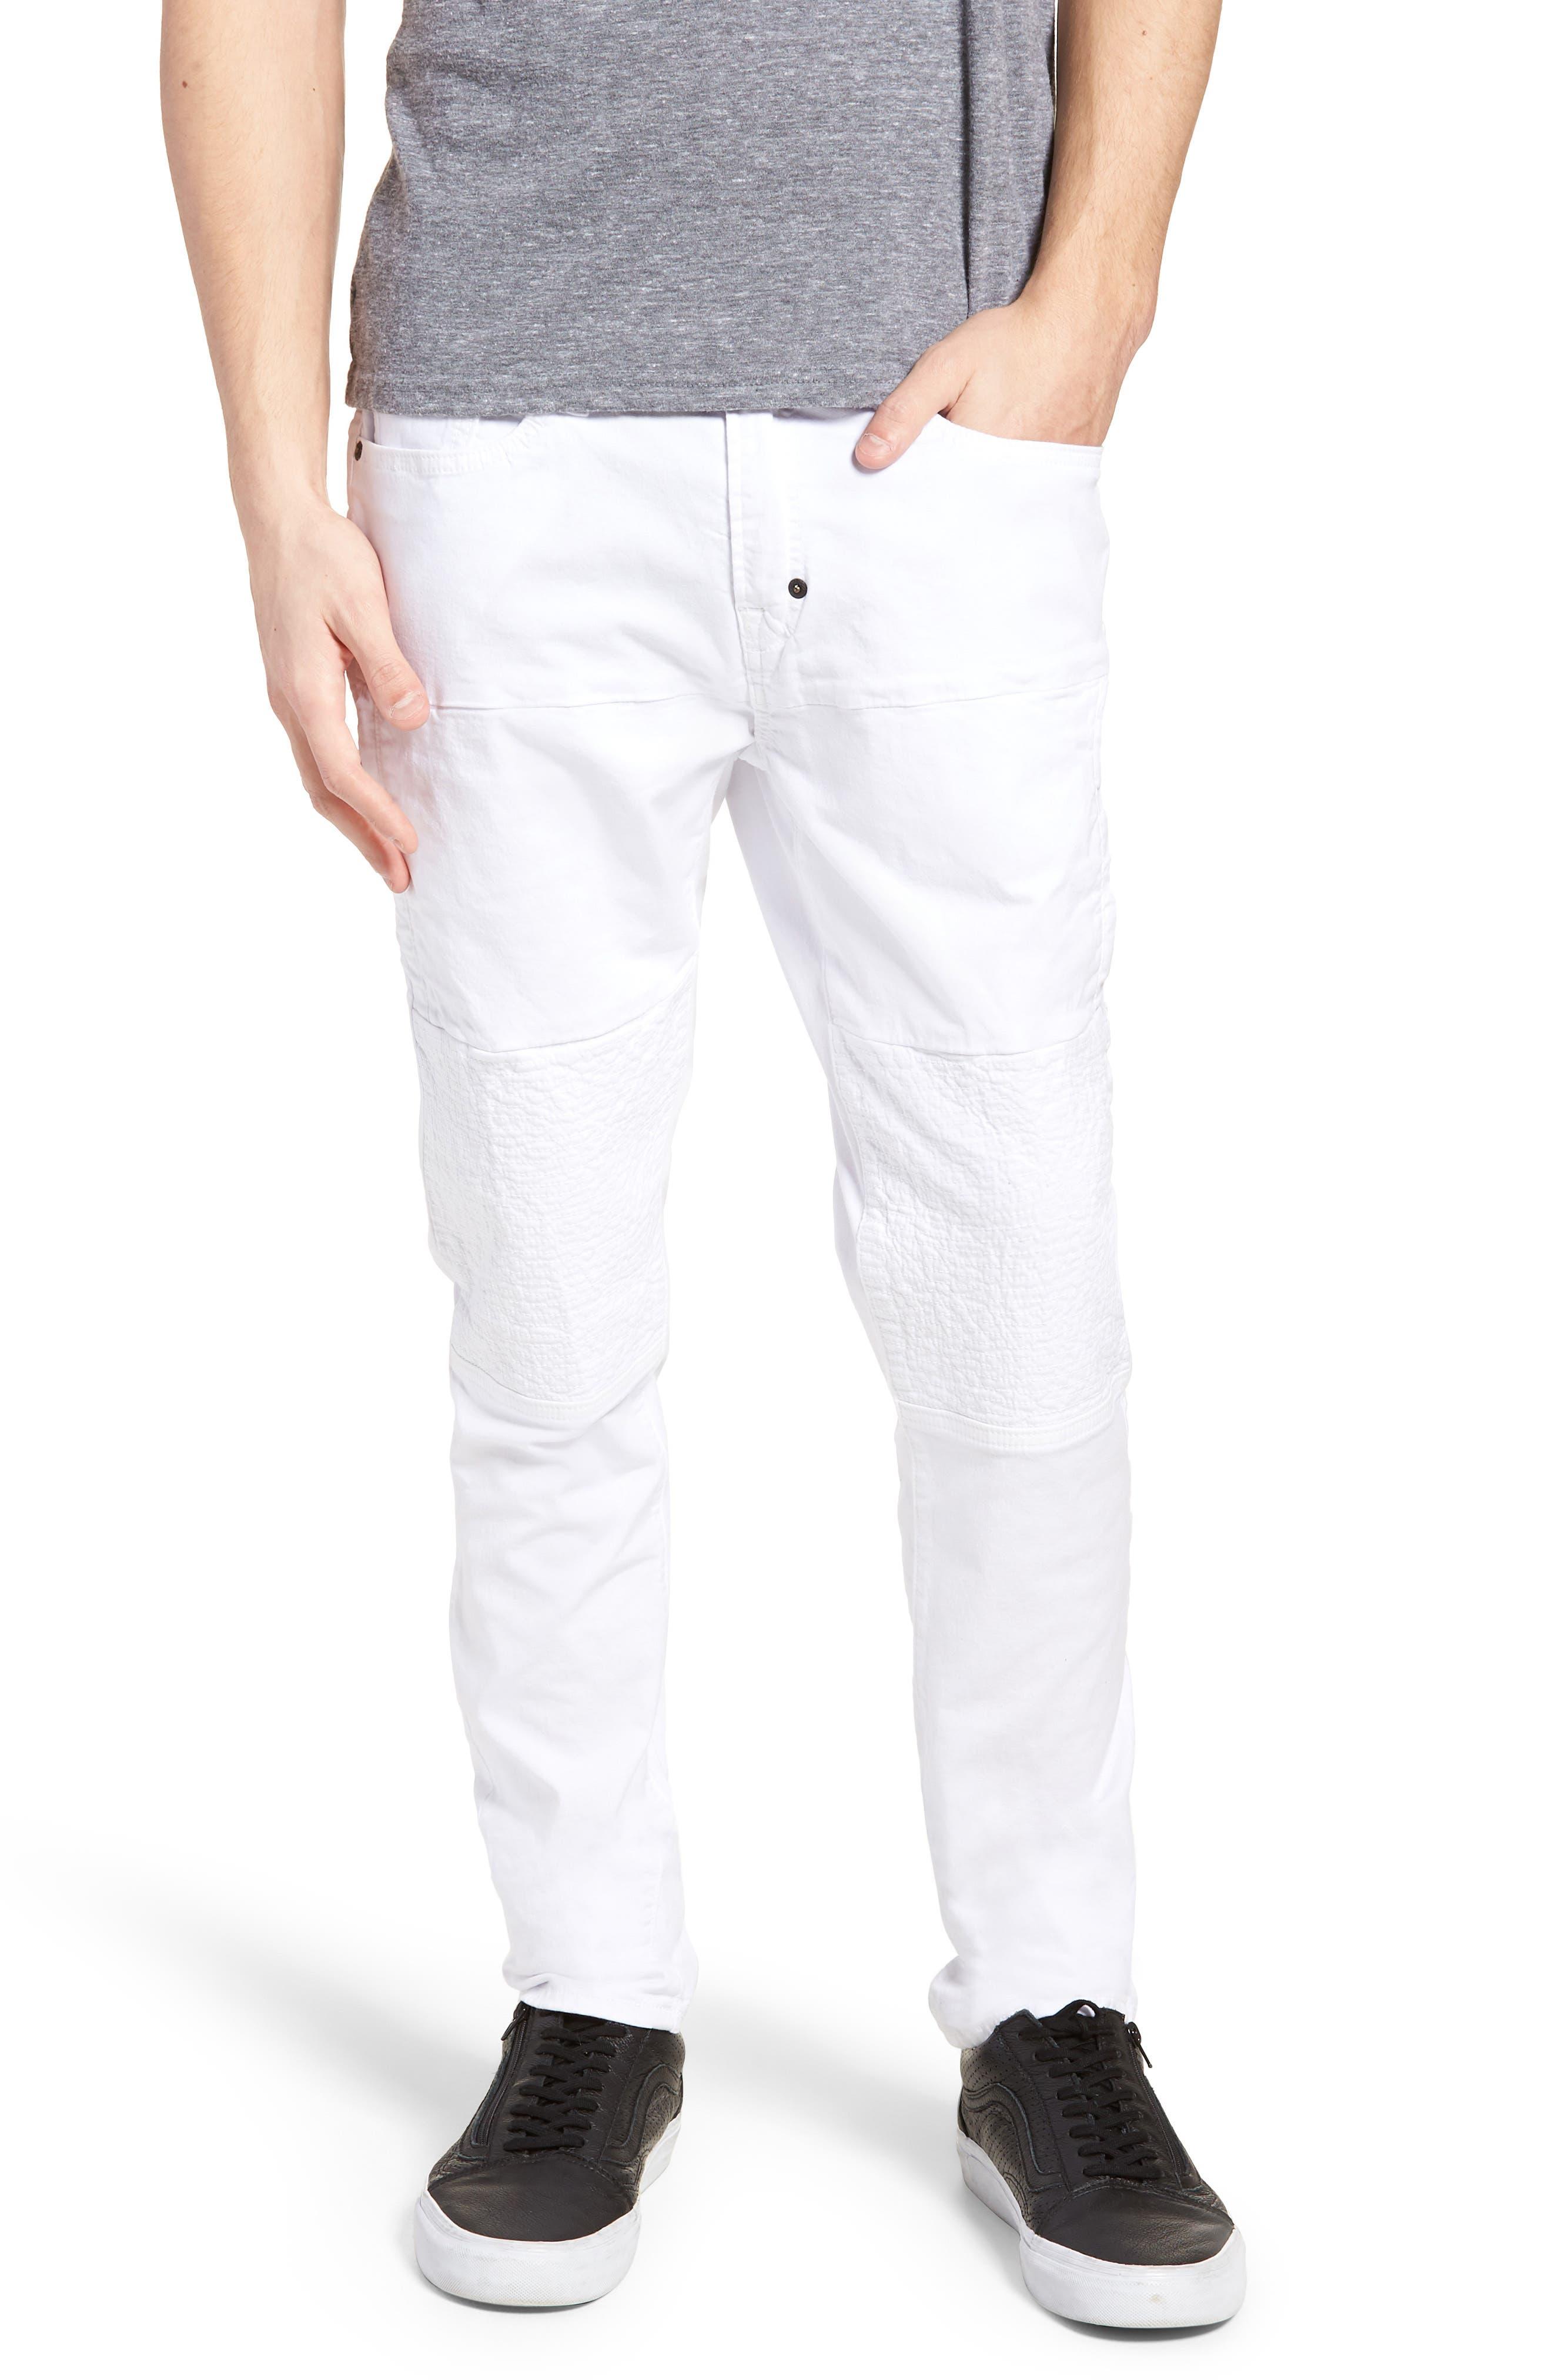 Windsor Slim Fit Jeans,                             Main thumbnail 1, color,                             SKELETON